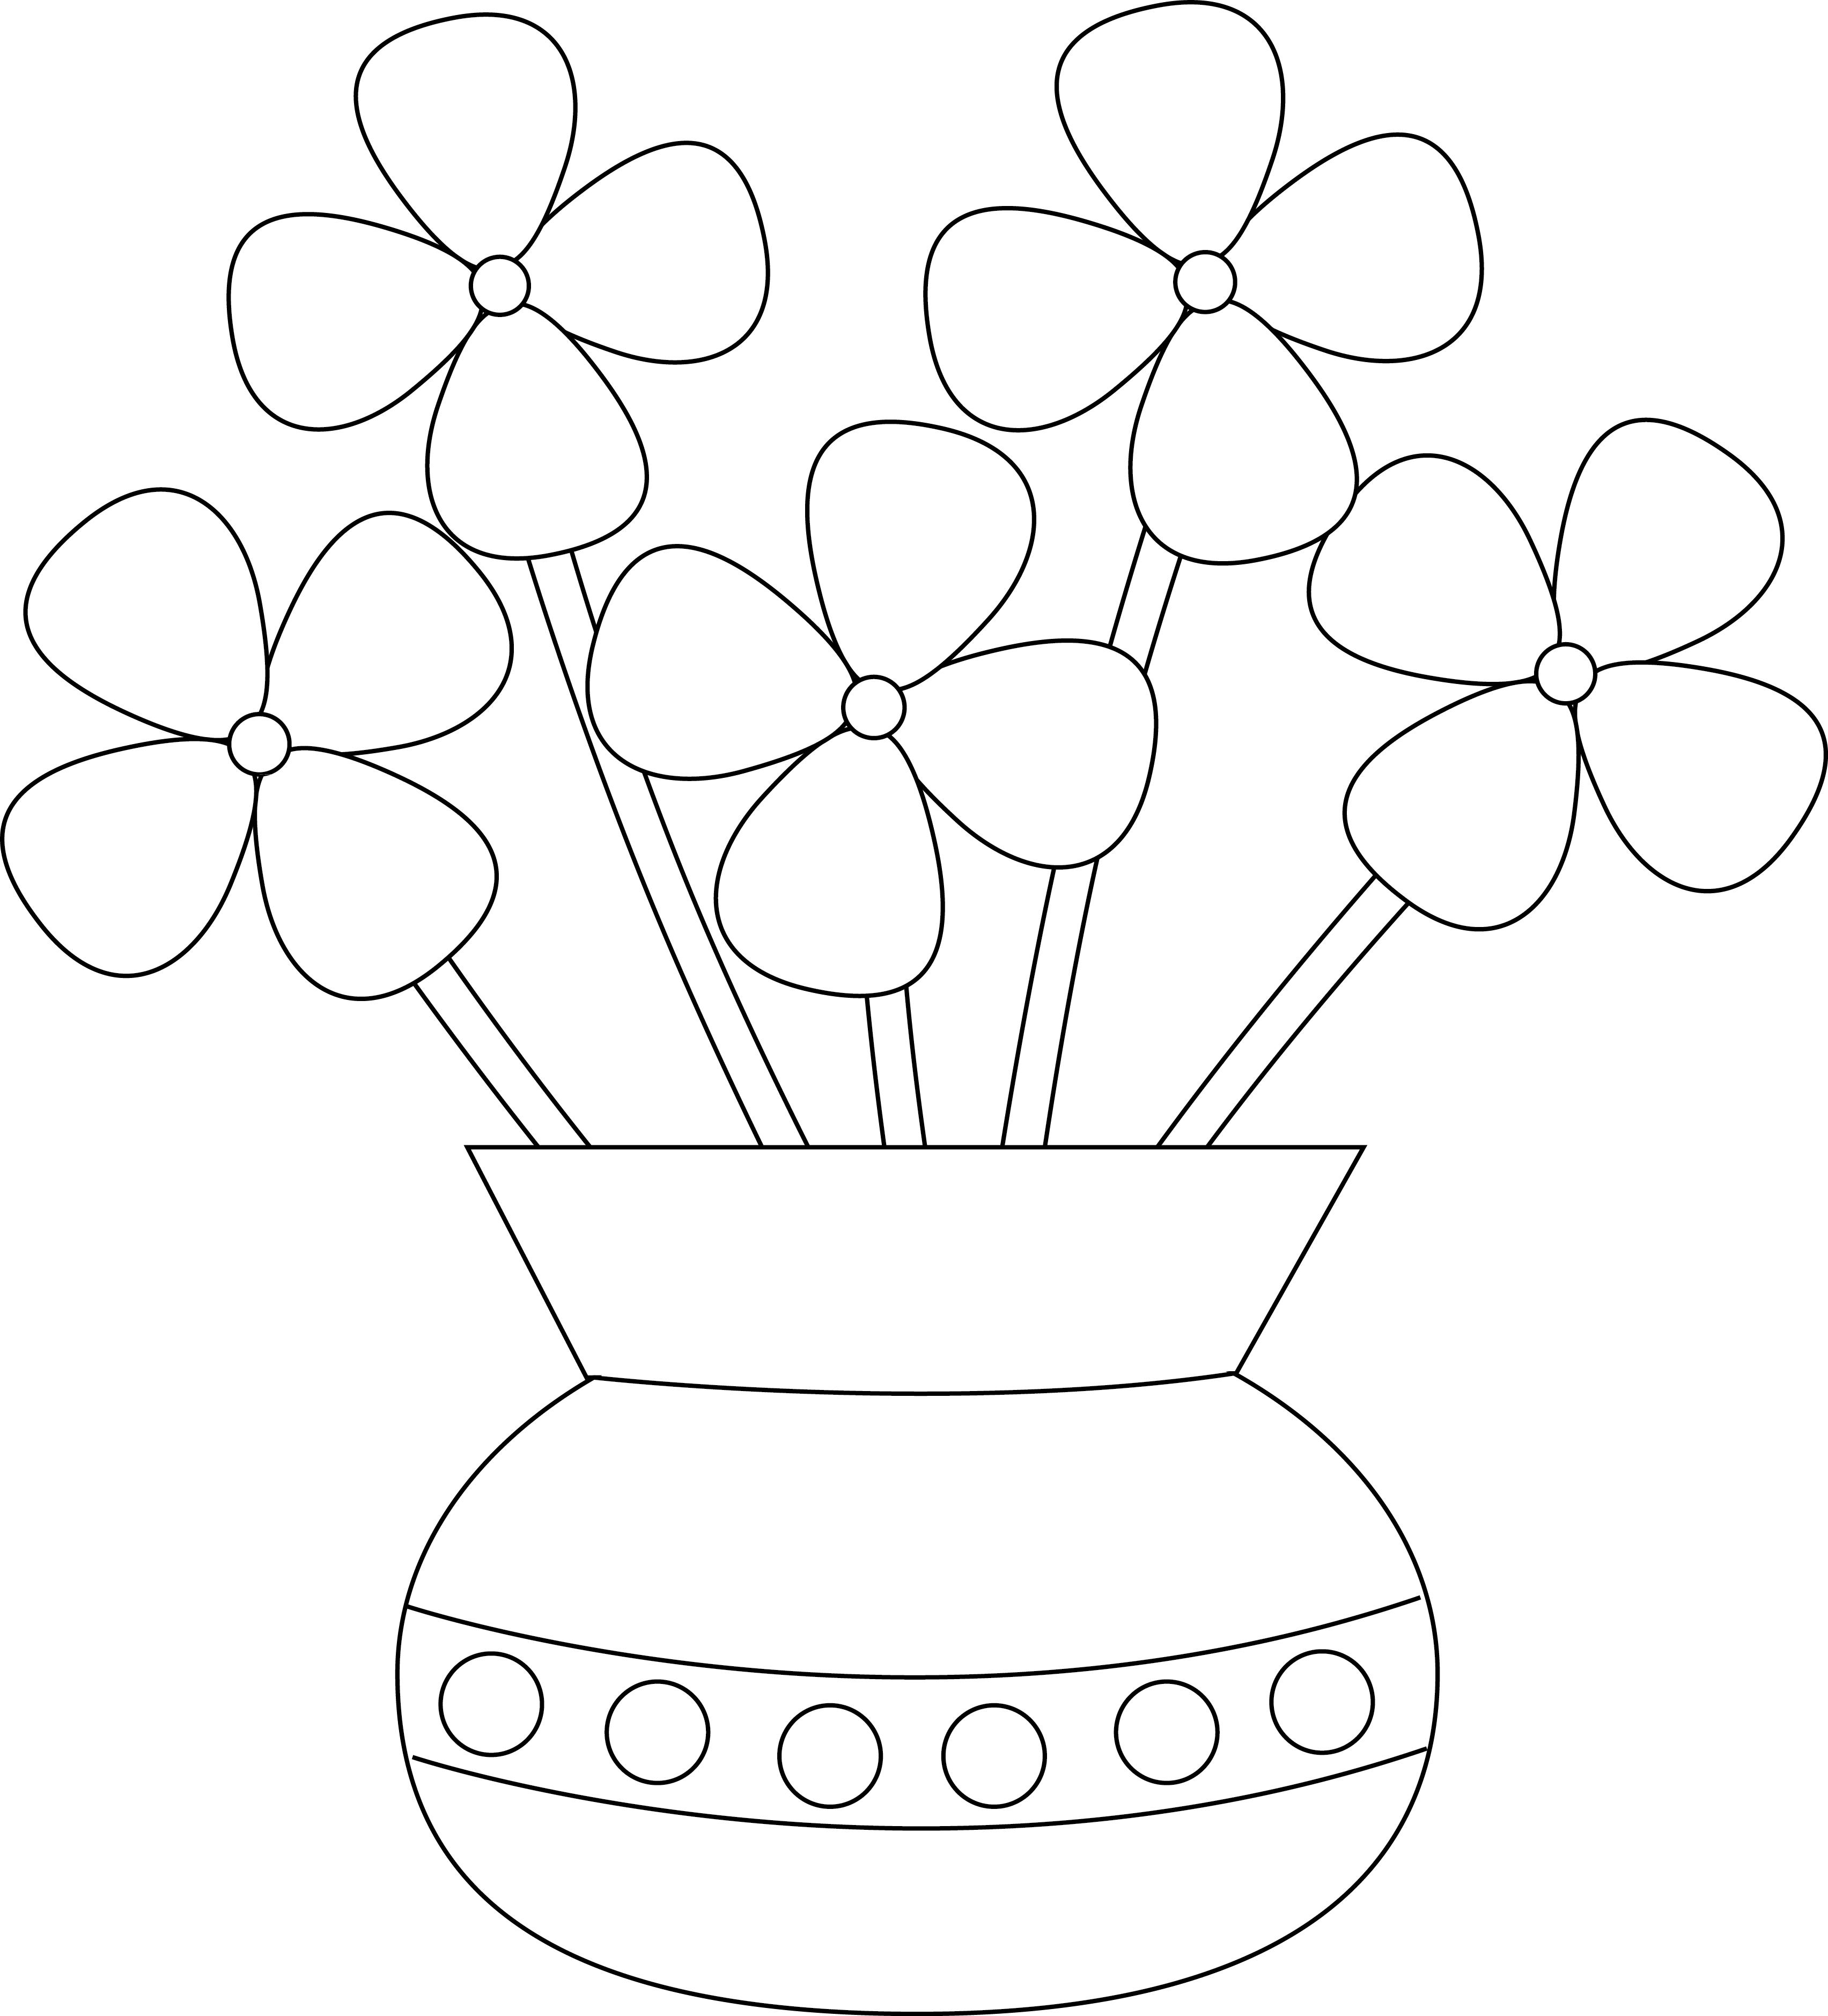 3408x3758 Draw A Flower Vase For Kids Vase Drawing For Kids Flower Kid